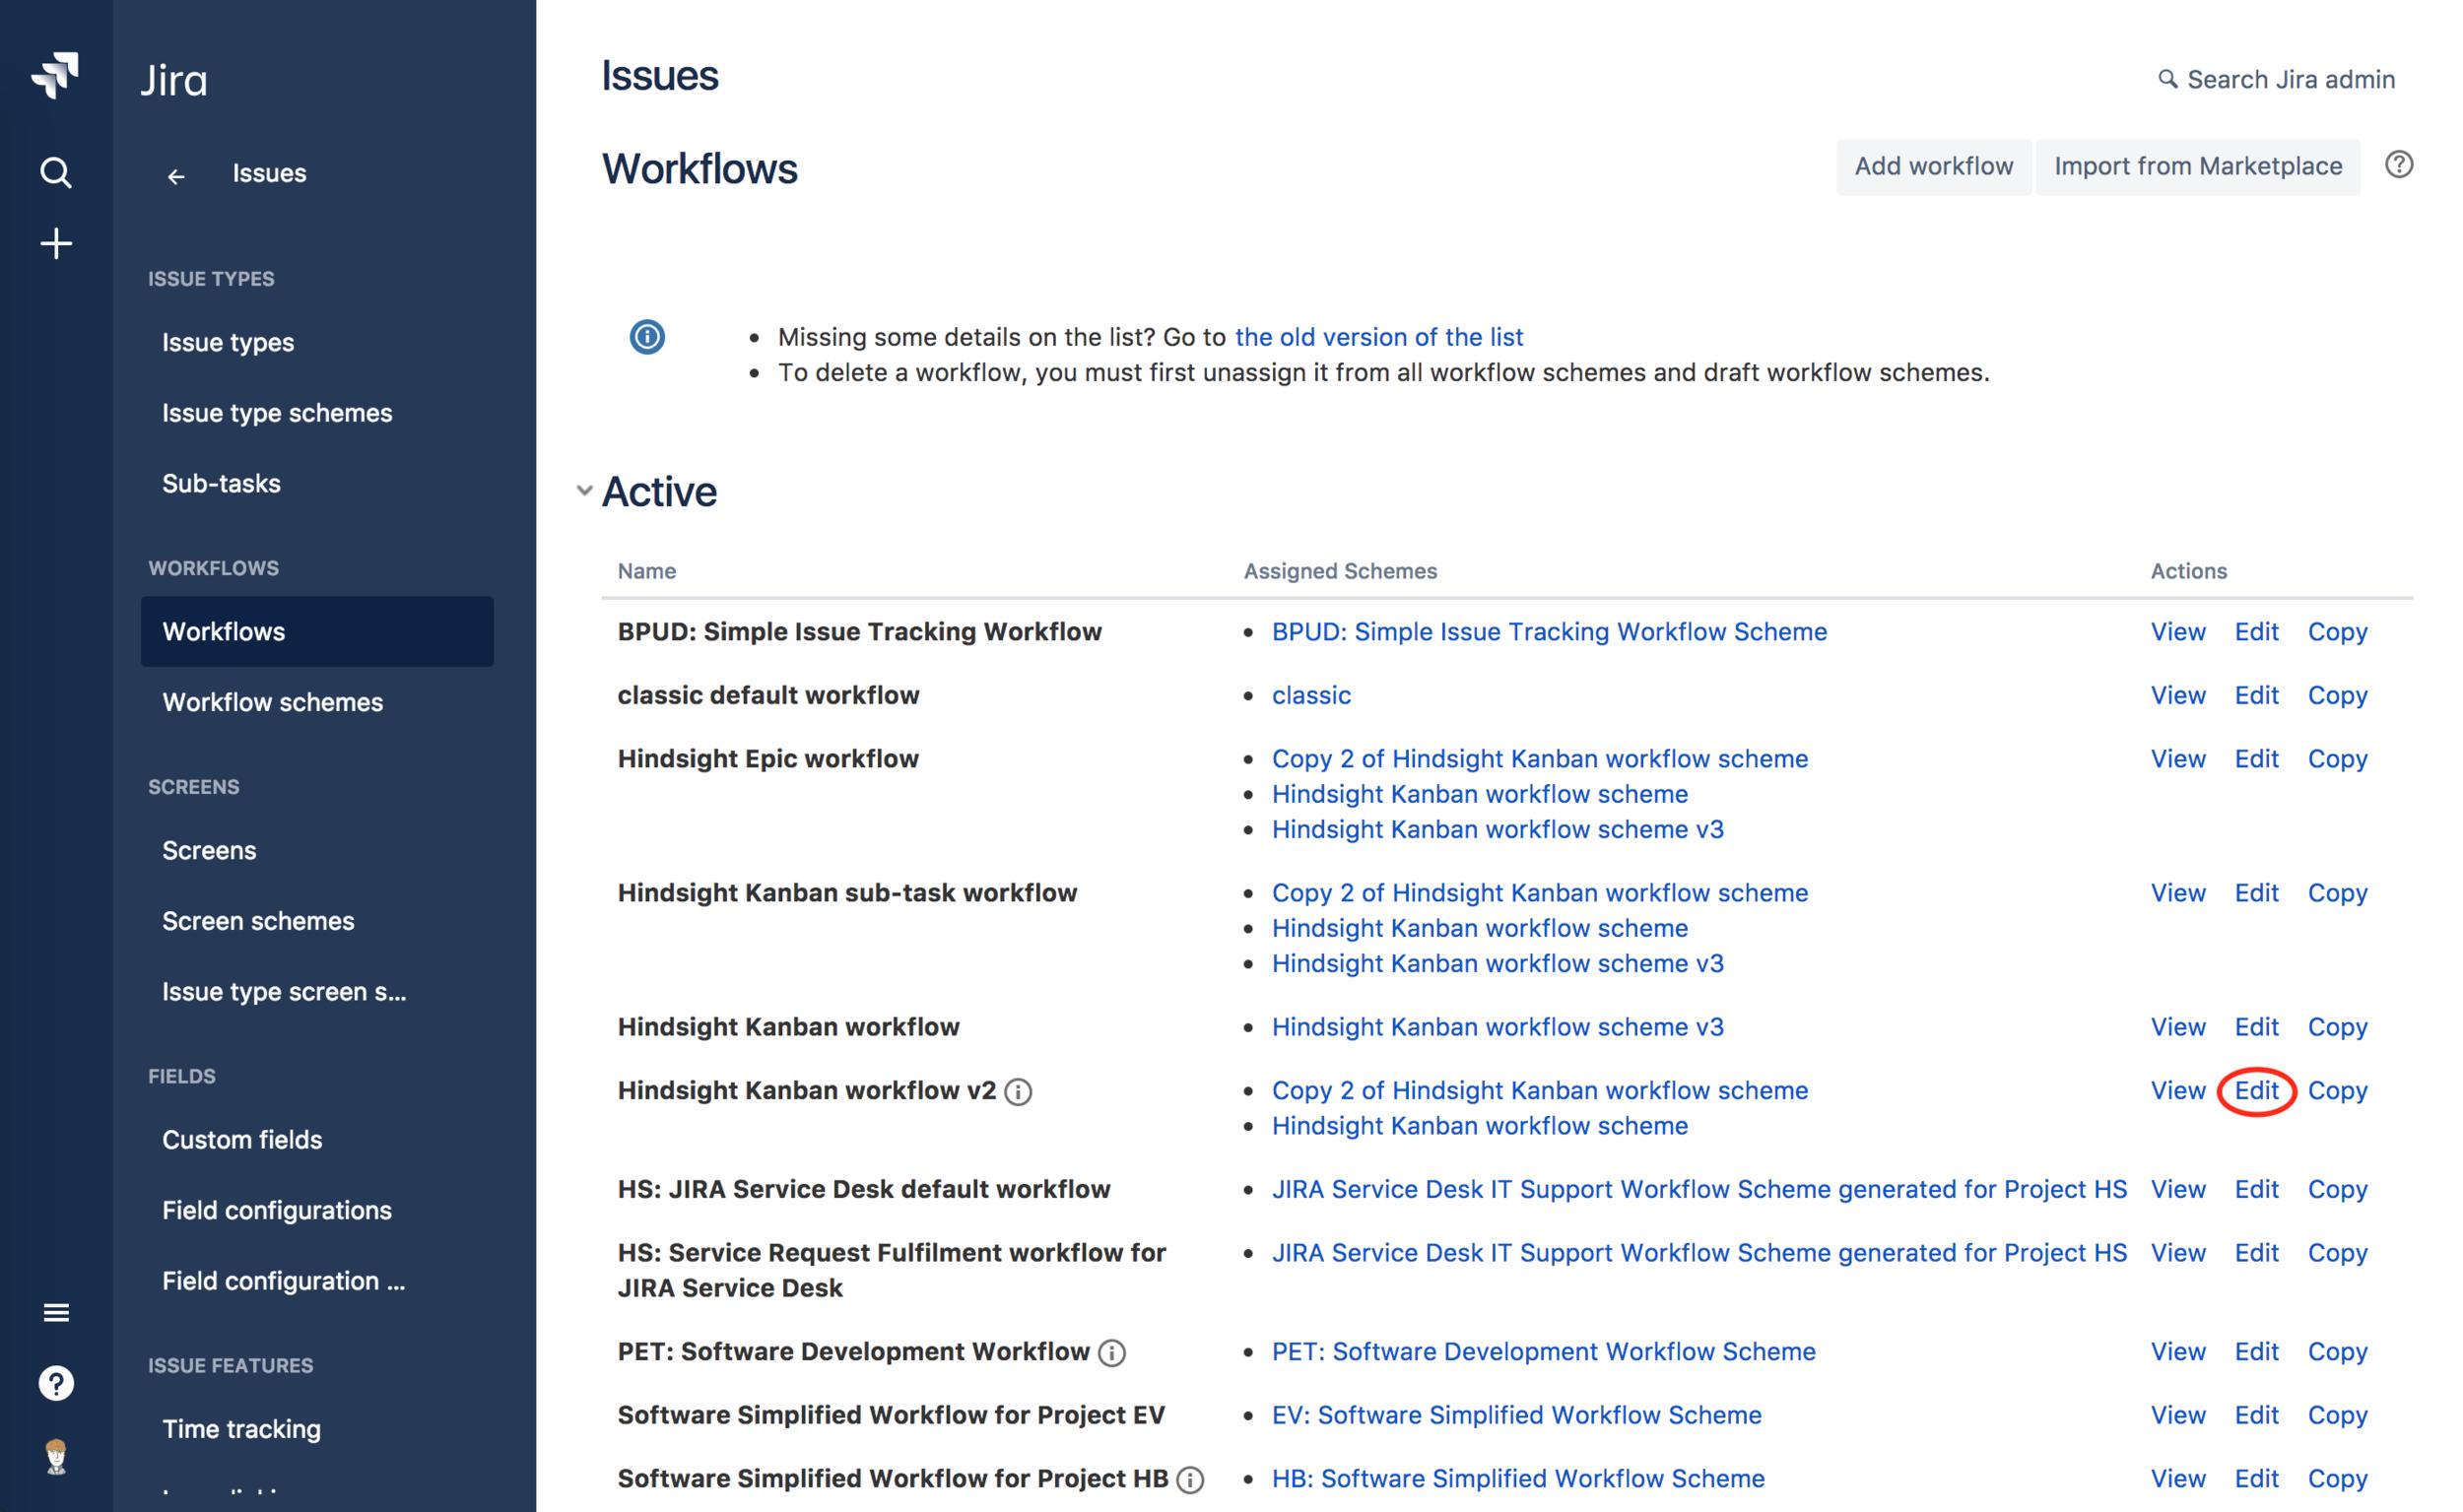 Hindsight workflows screenshot